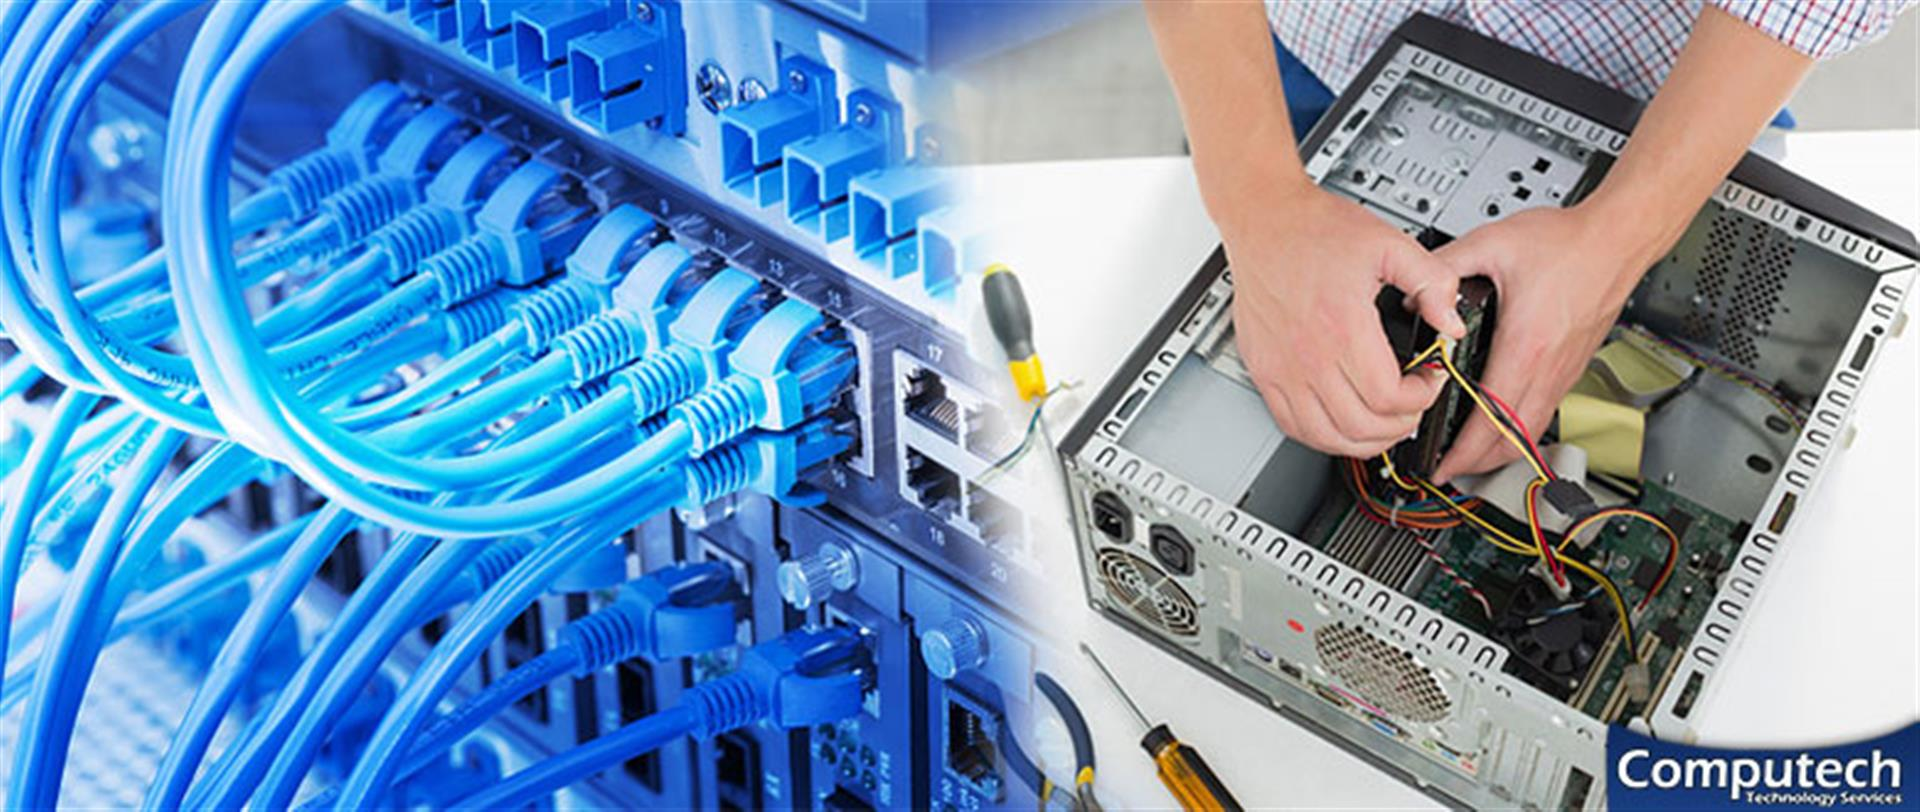 Jemison Alabama On-Site PC & Printer Repair, Networking, Telecom & Data Wiring Services